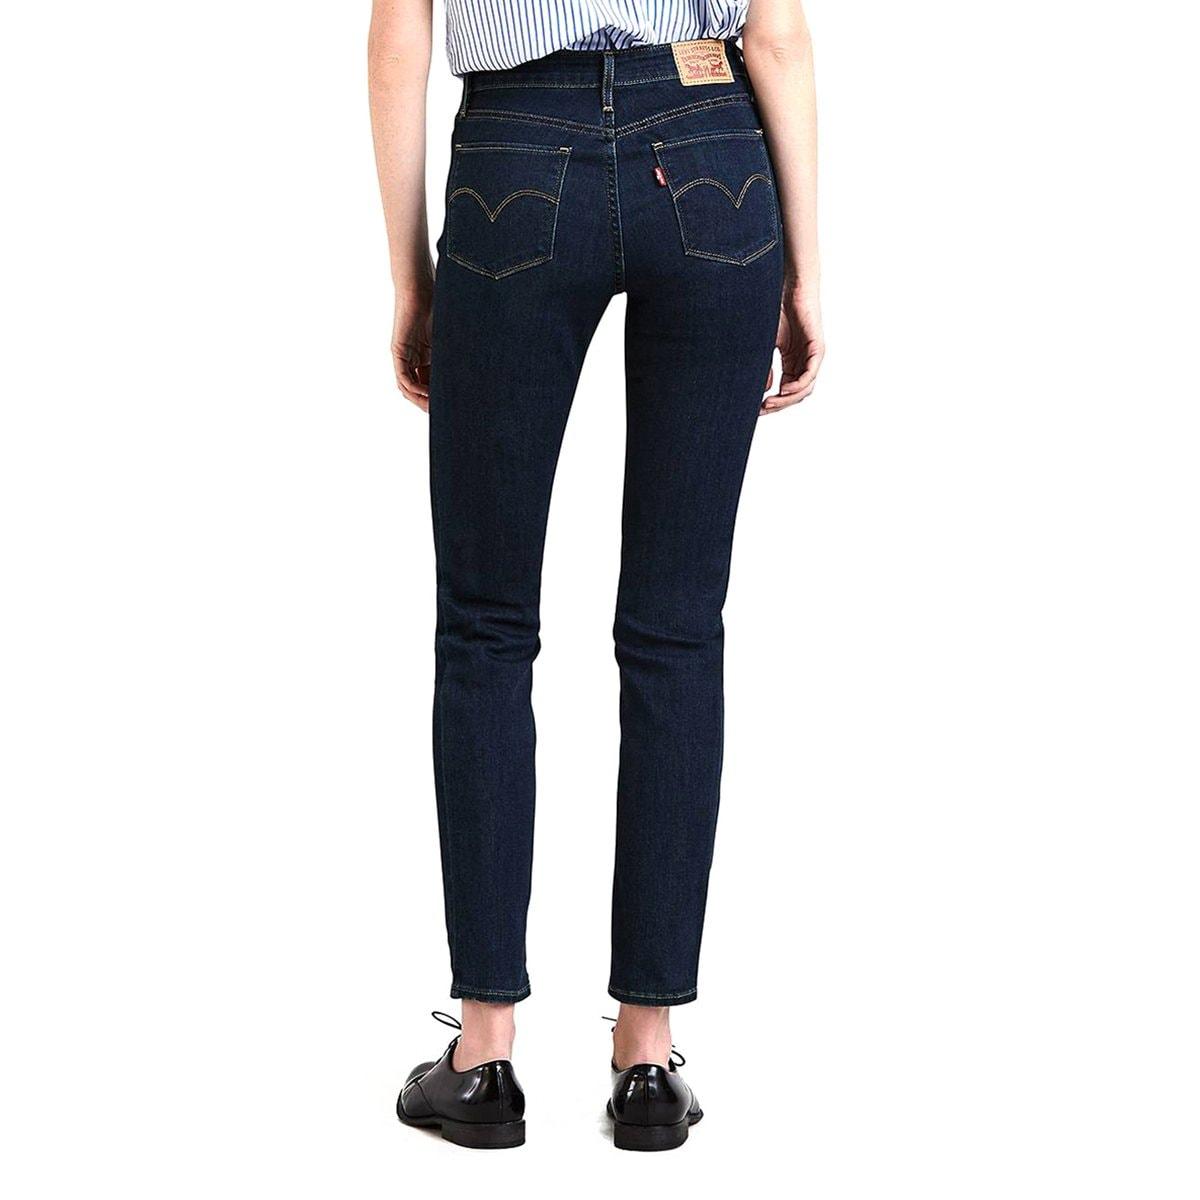 Jeans 712 Slim Levis para Dama